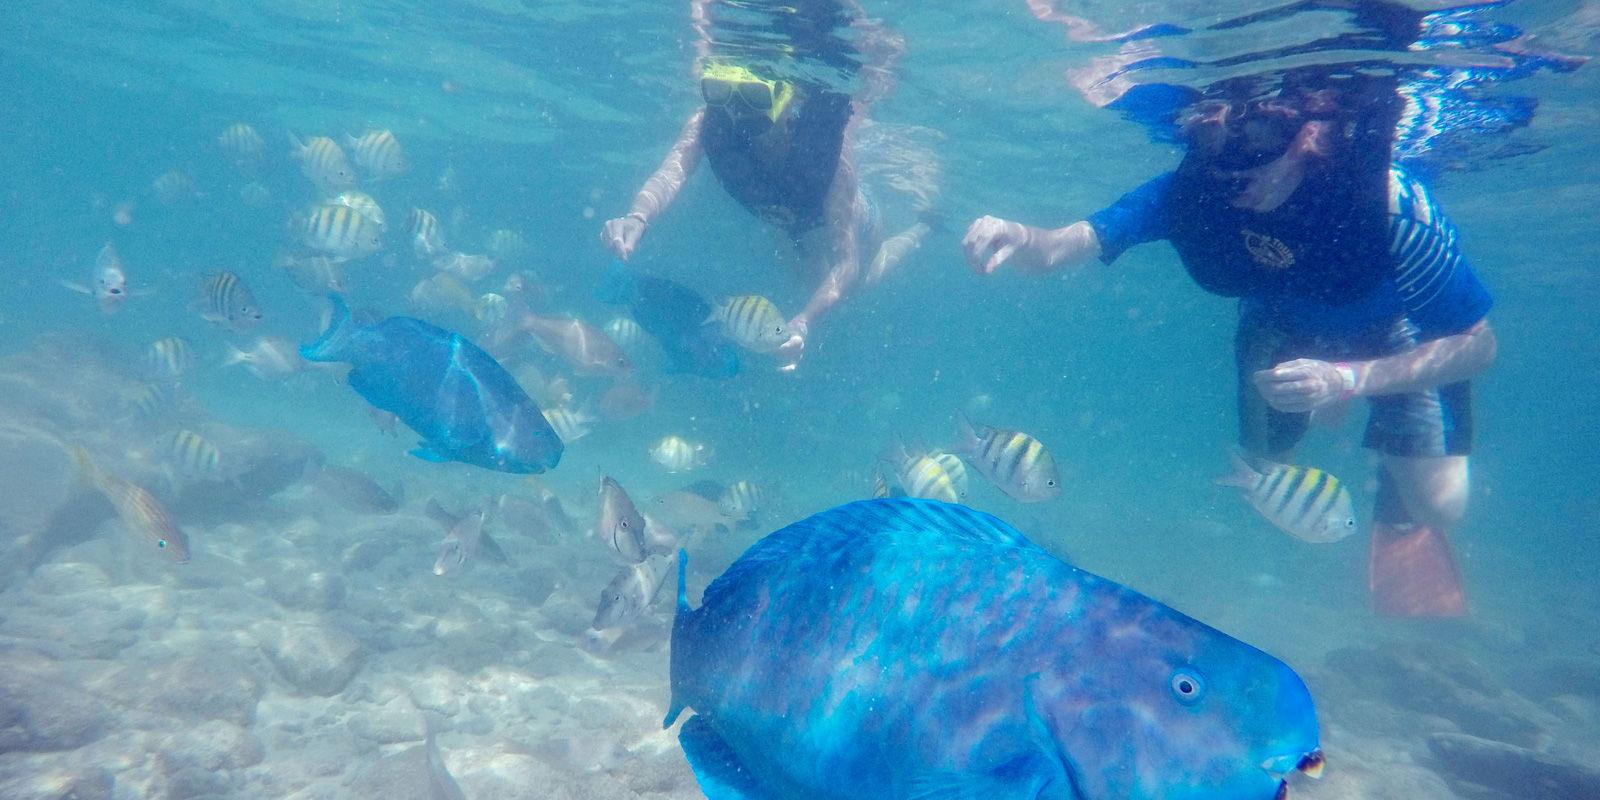 Eiland clipart beach scene Island Aruba island De slide